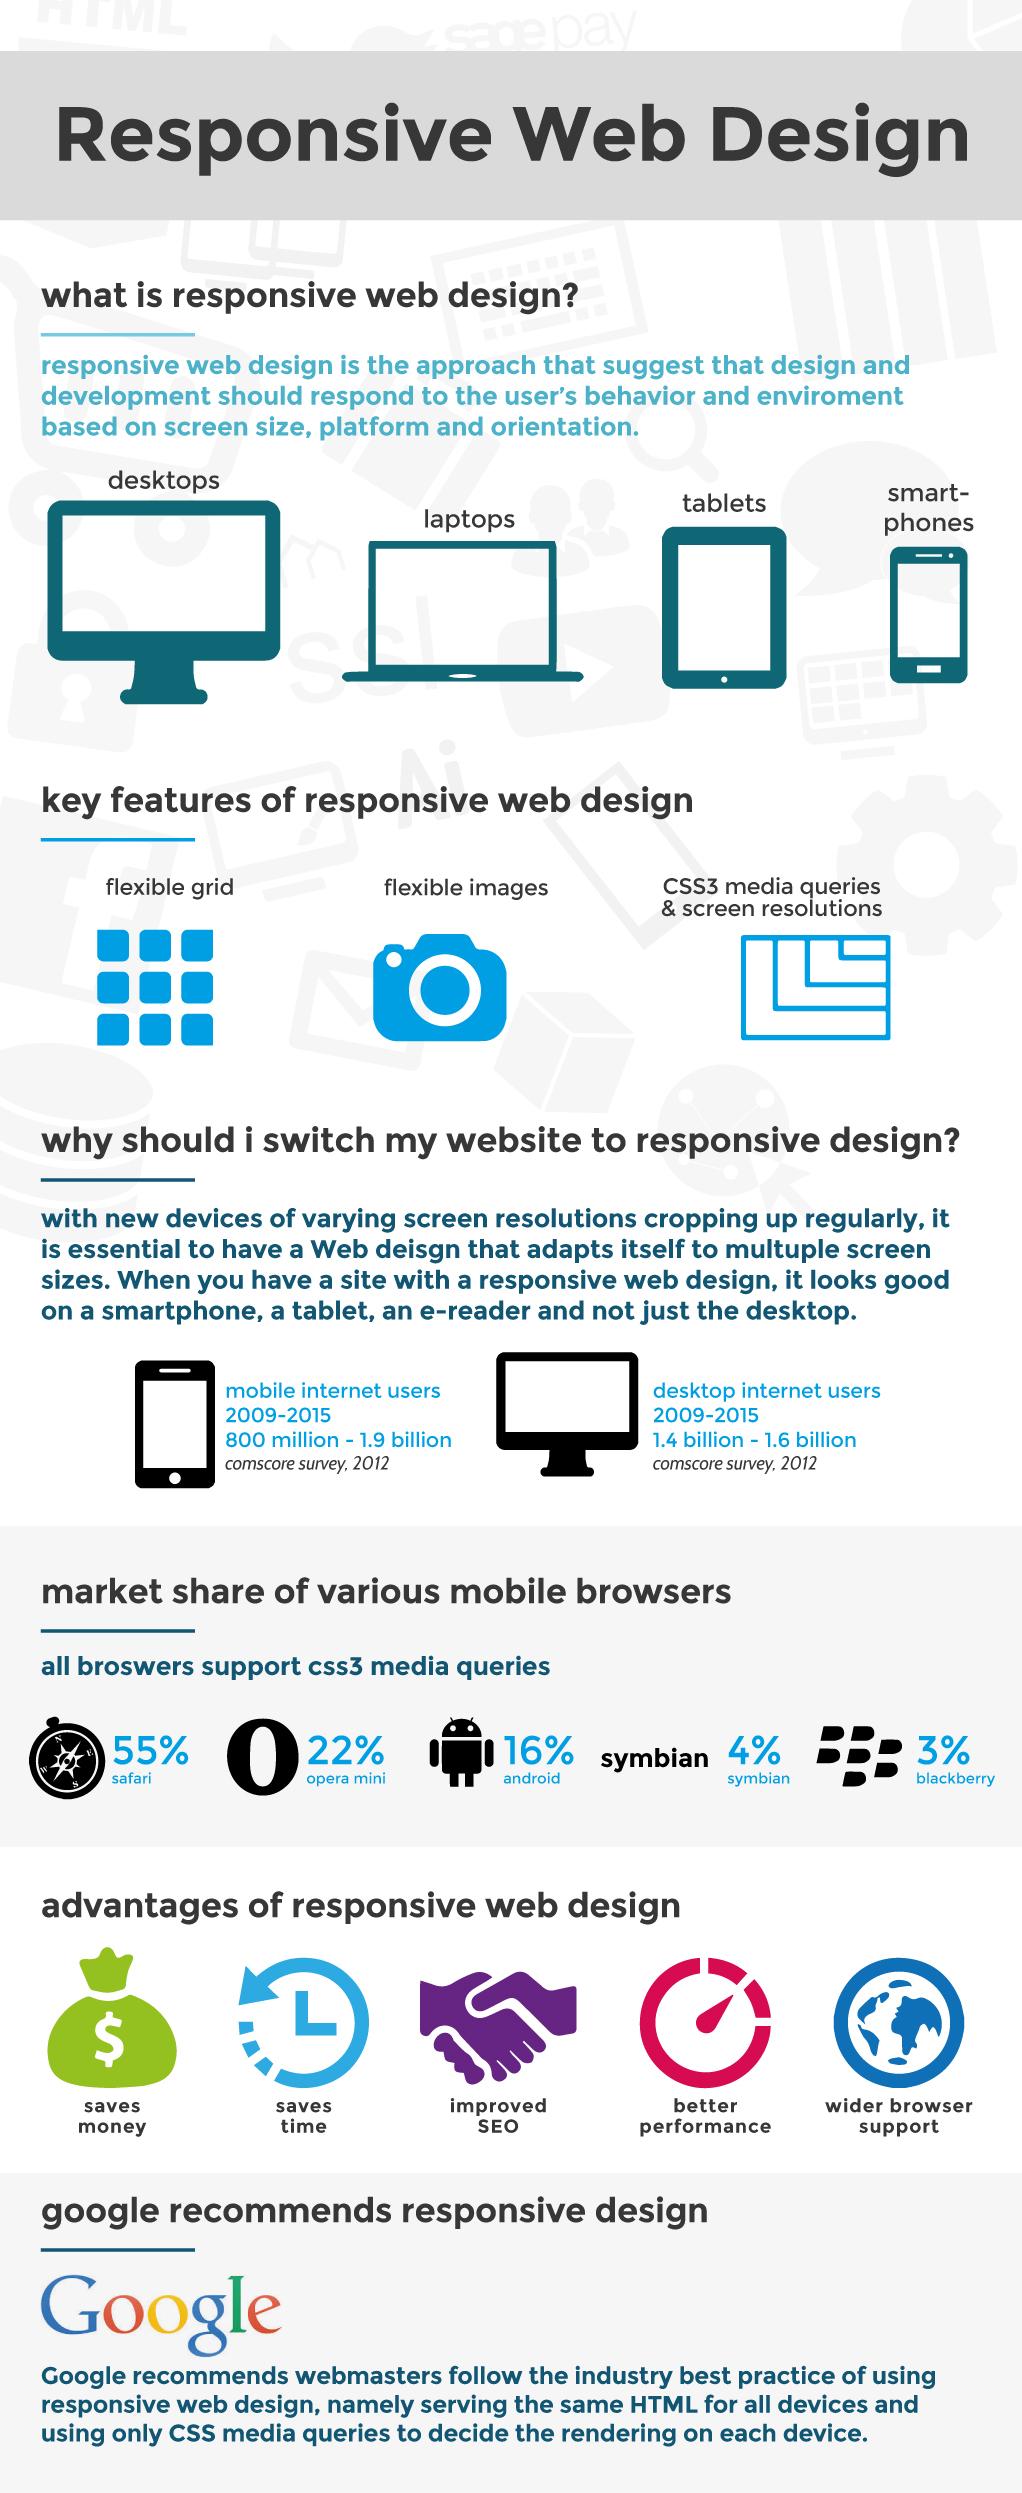 Web Theoria S Infographic On Responsive Web Design Web Theoria